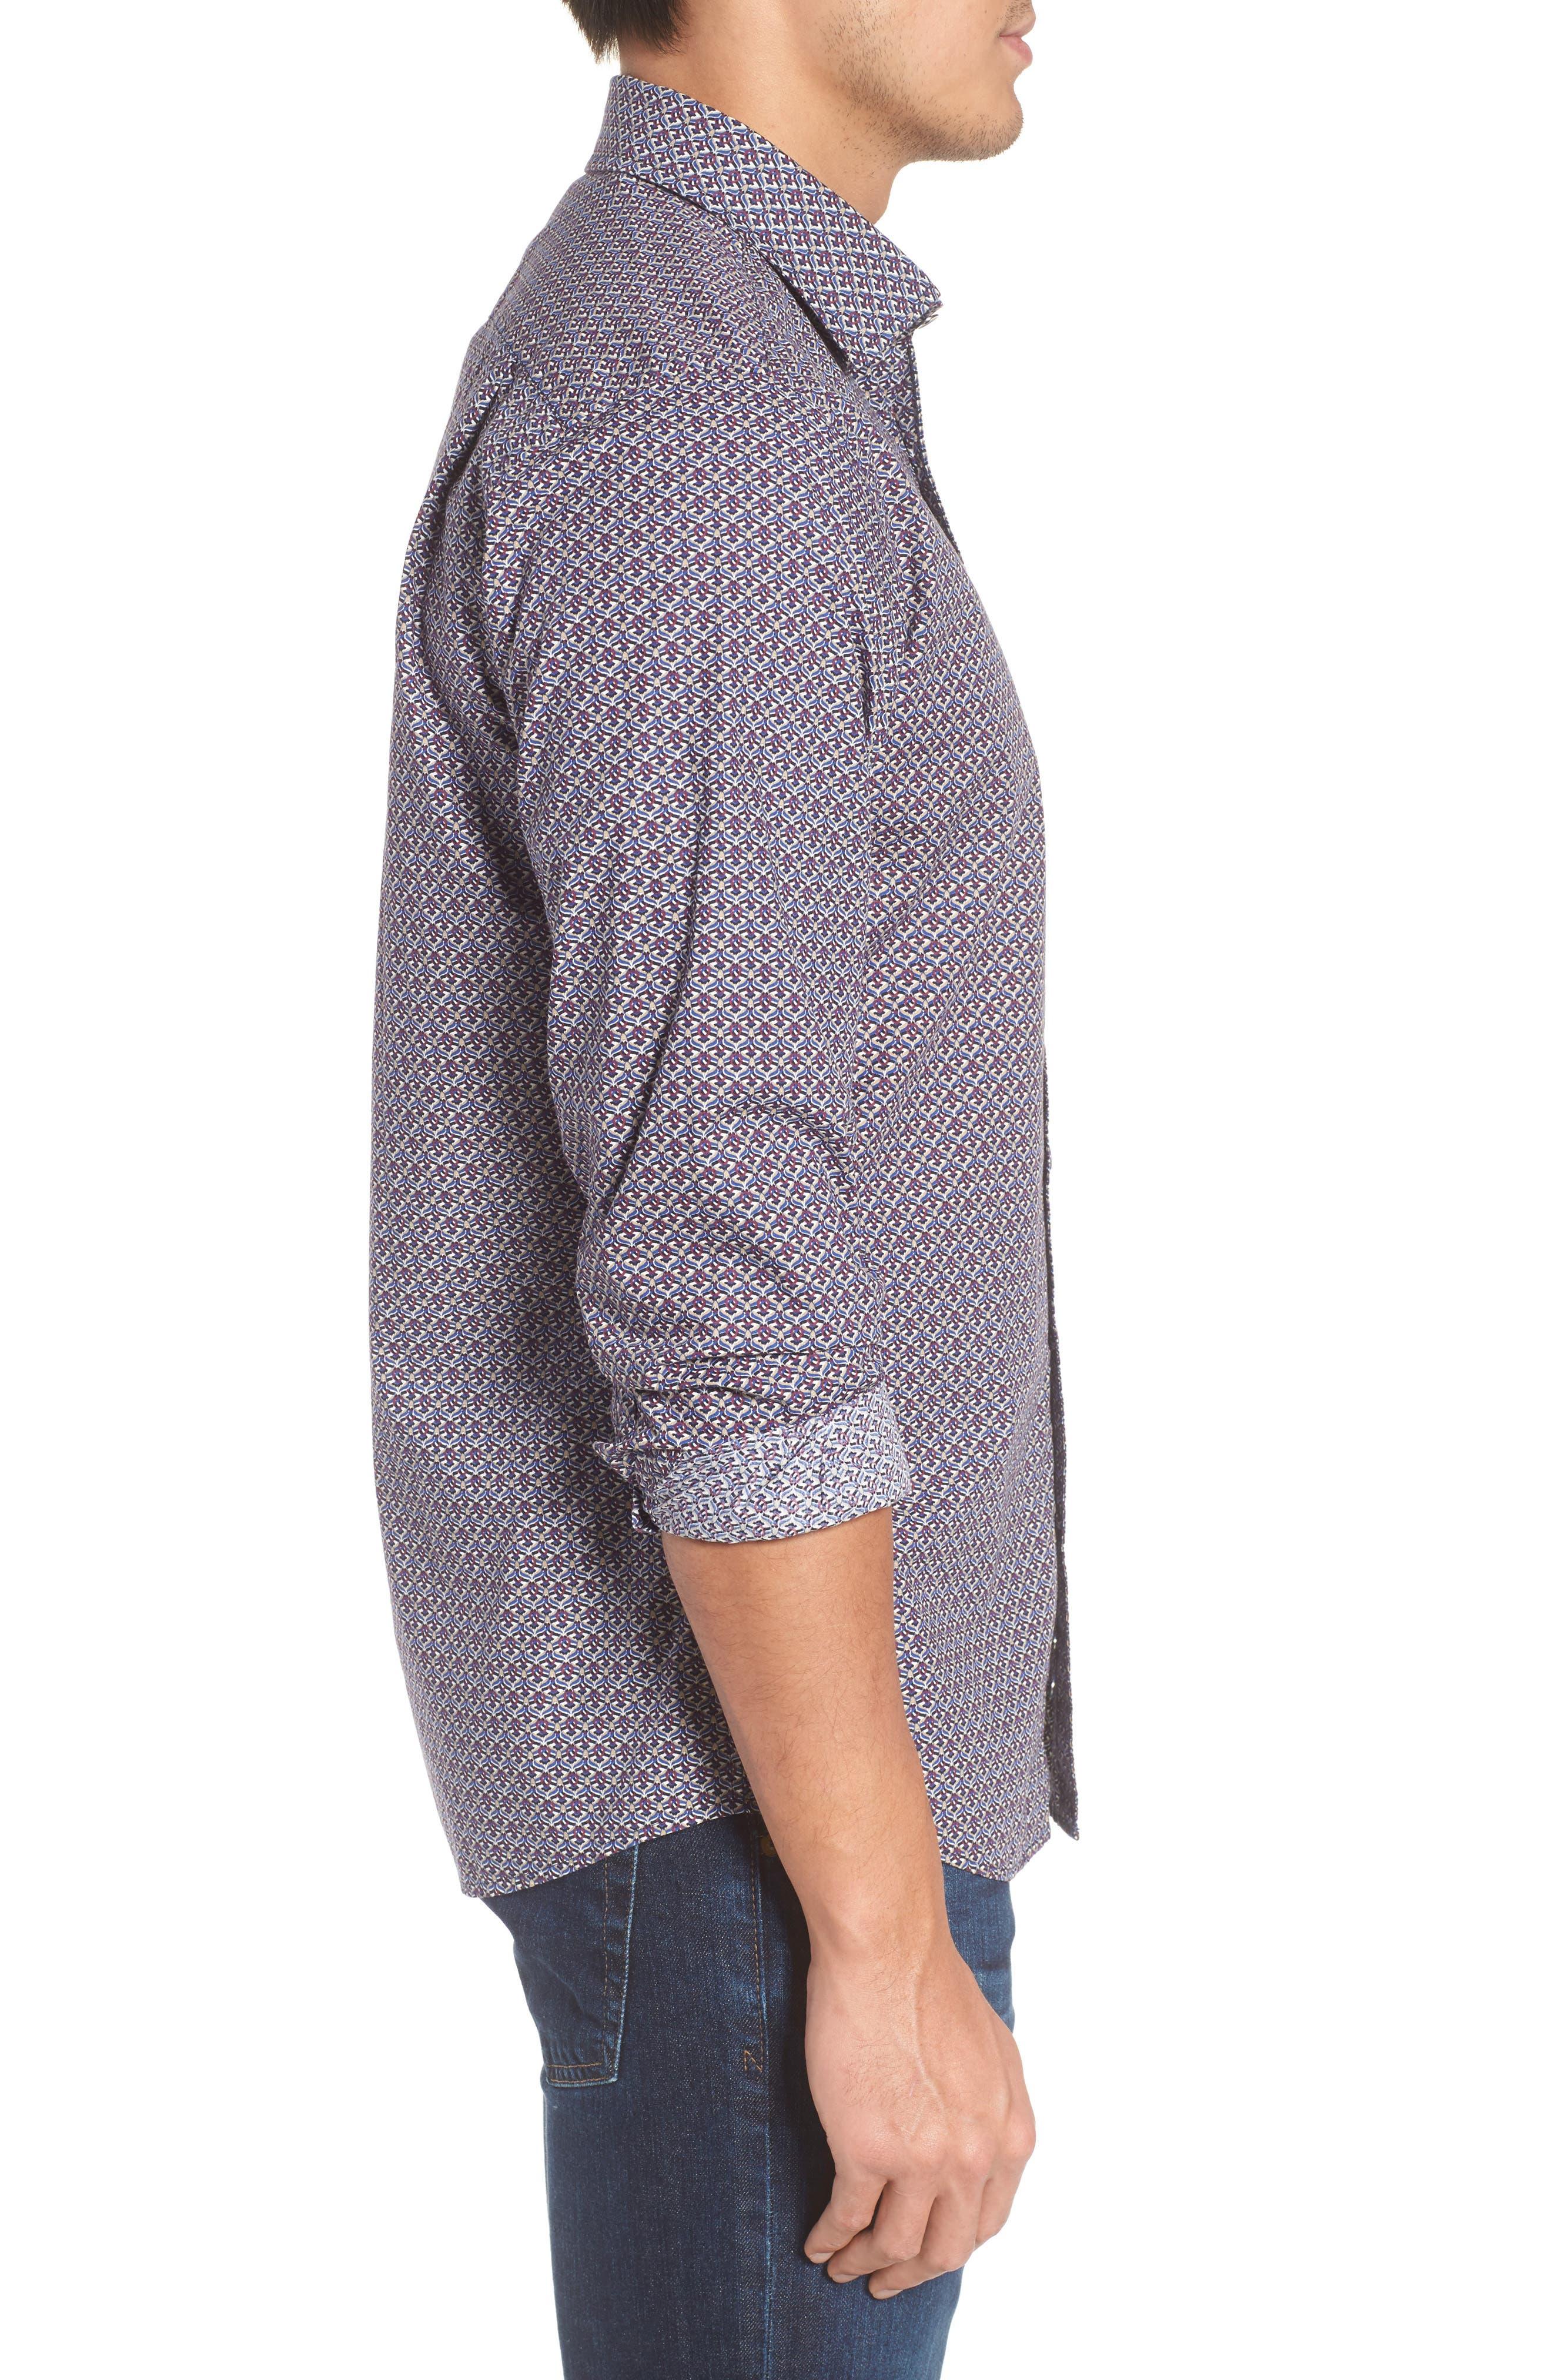 Fenton Park Regular Fit Sport Shirt,                             Alternate thumbnail 3, color,                             Royal